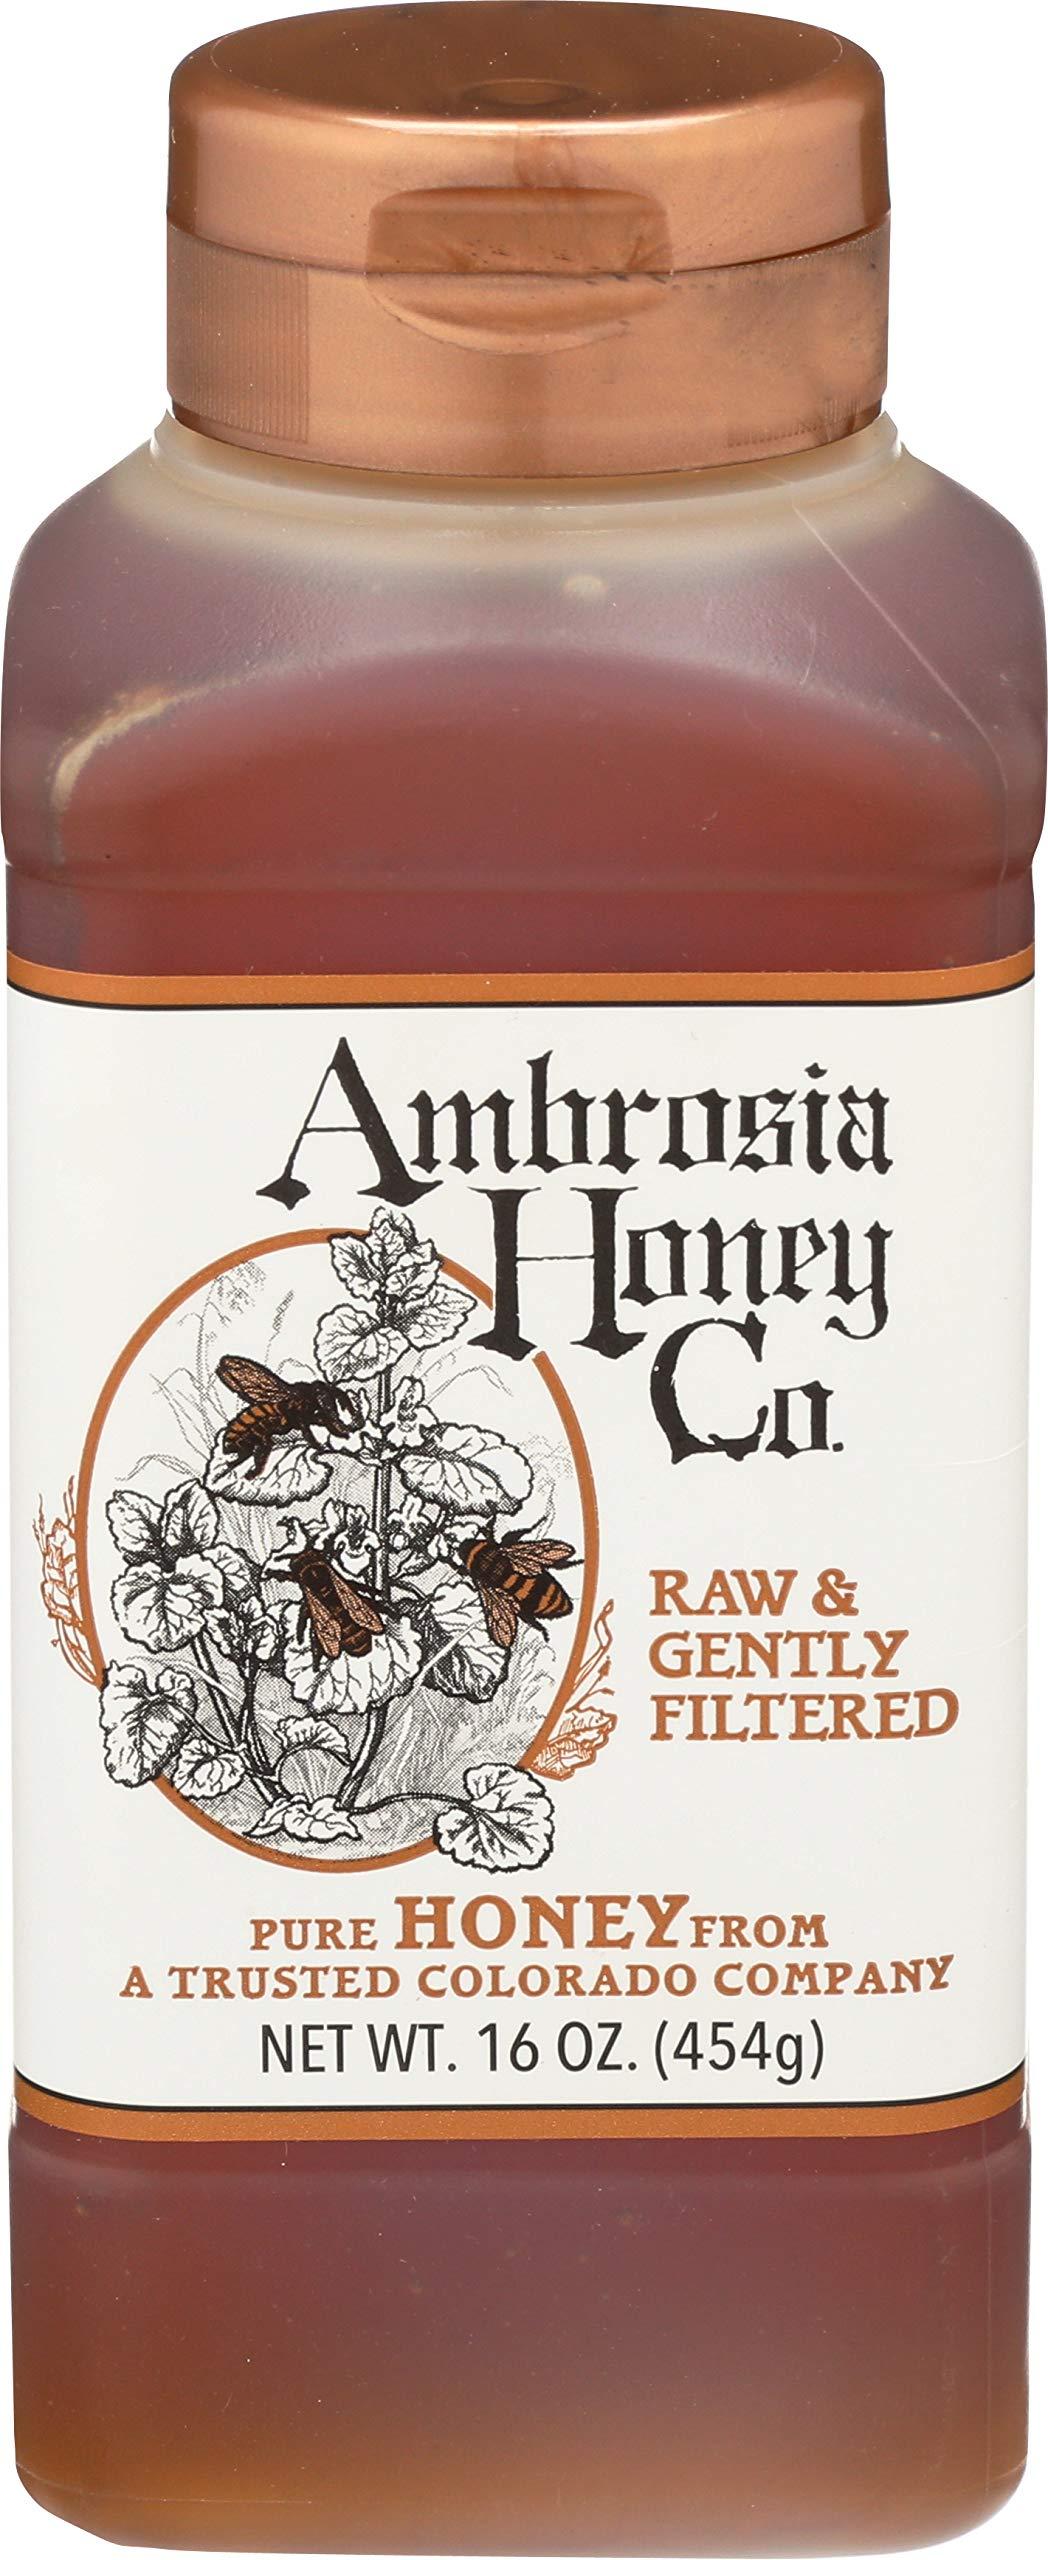 AMBROSIA HONEY CO. Gently Strained Honey, 16 oz. Bottle (Pack of 4) | Natural Sweetener, Sugar Alternative | 100% Pure Honey | US Honey | Liquid Sweetener